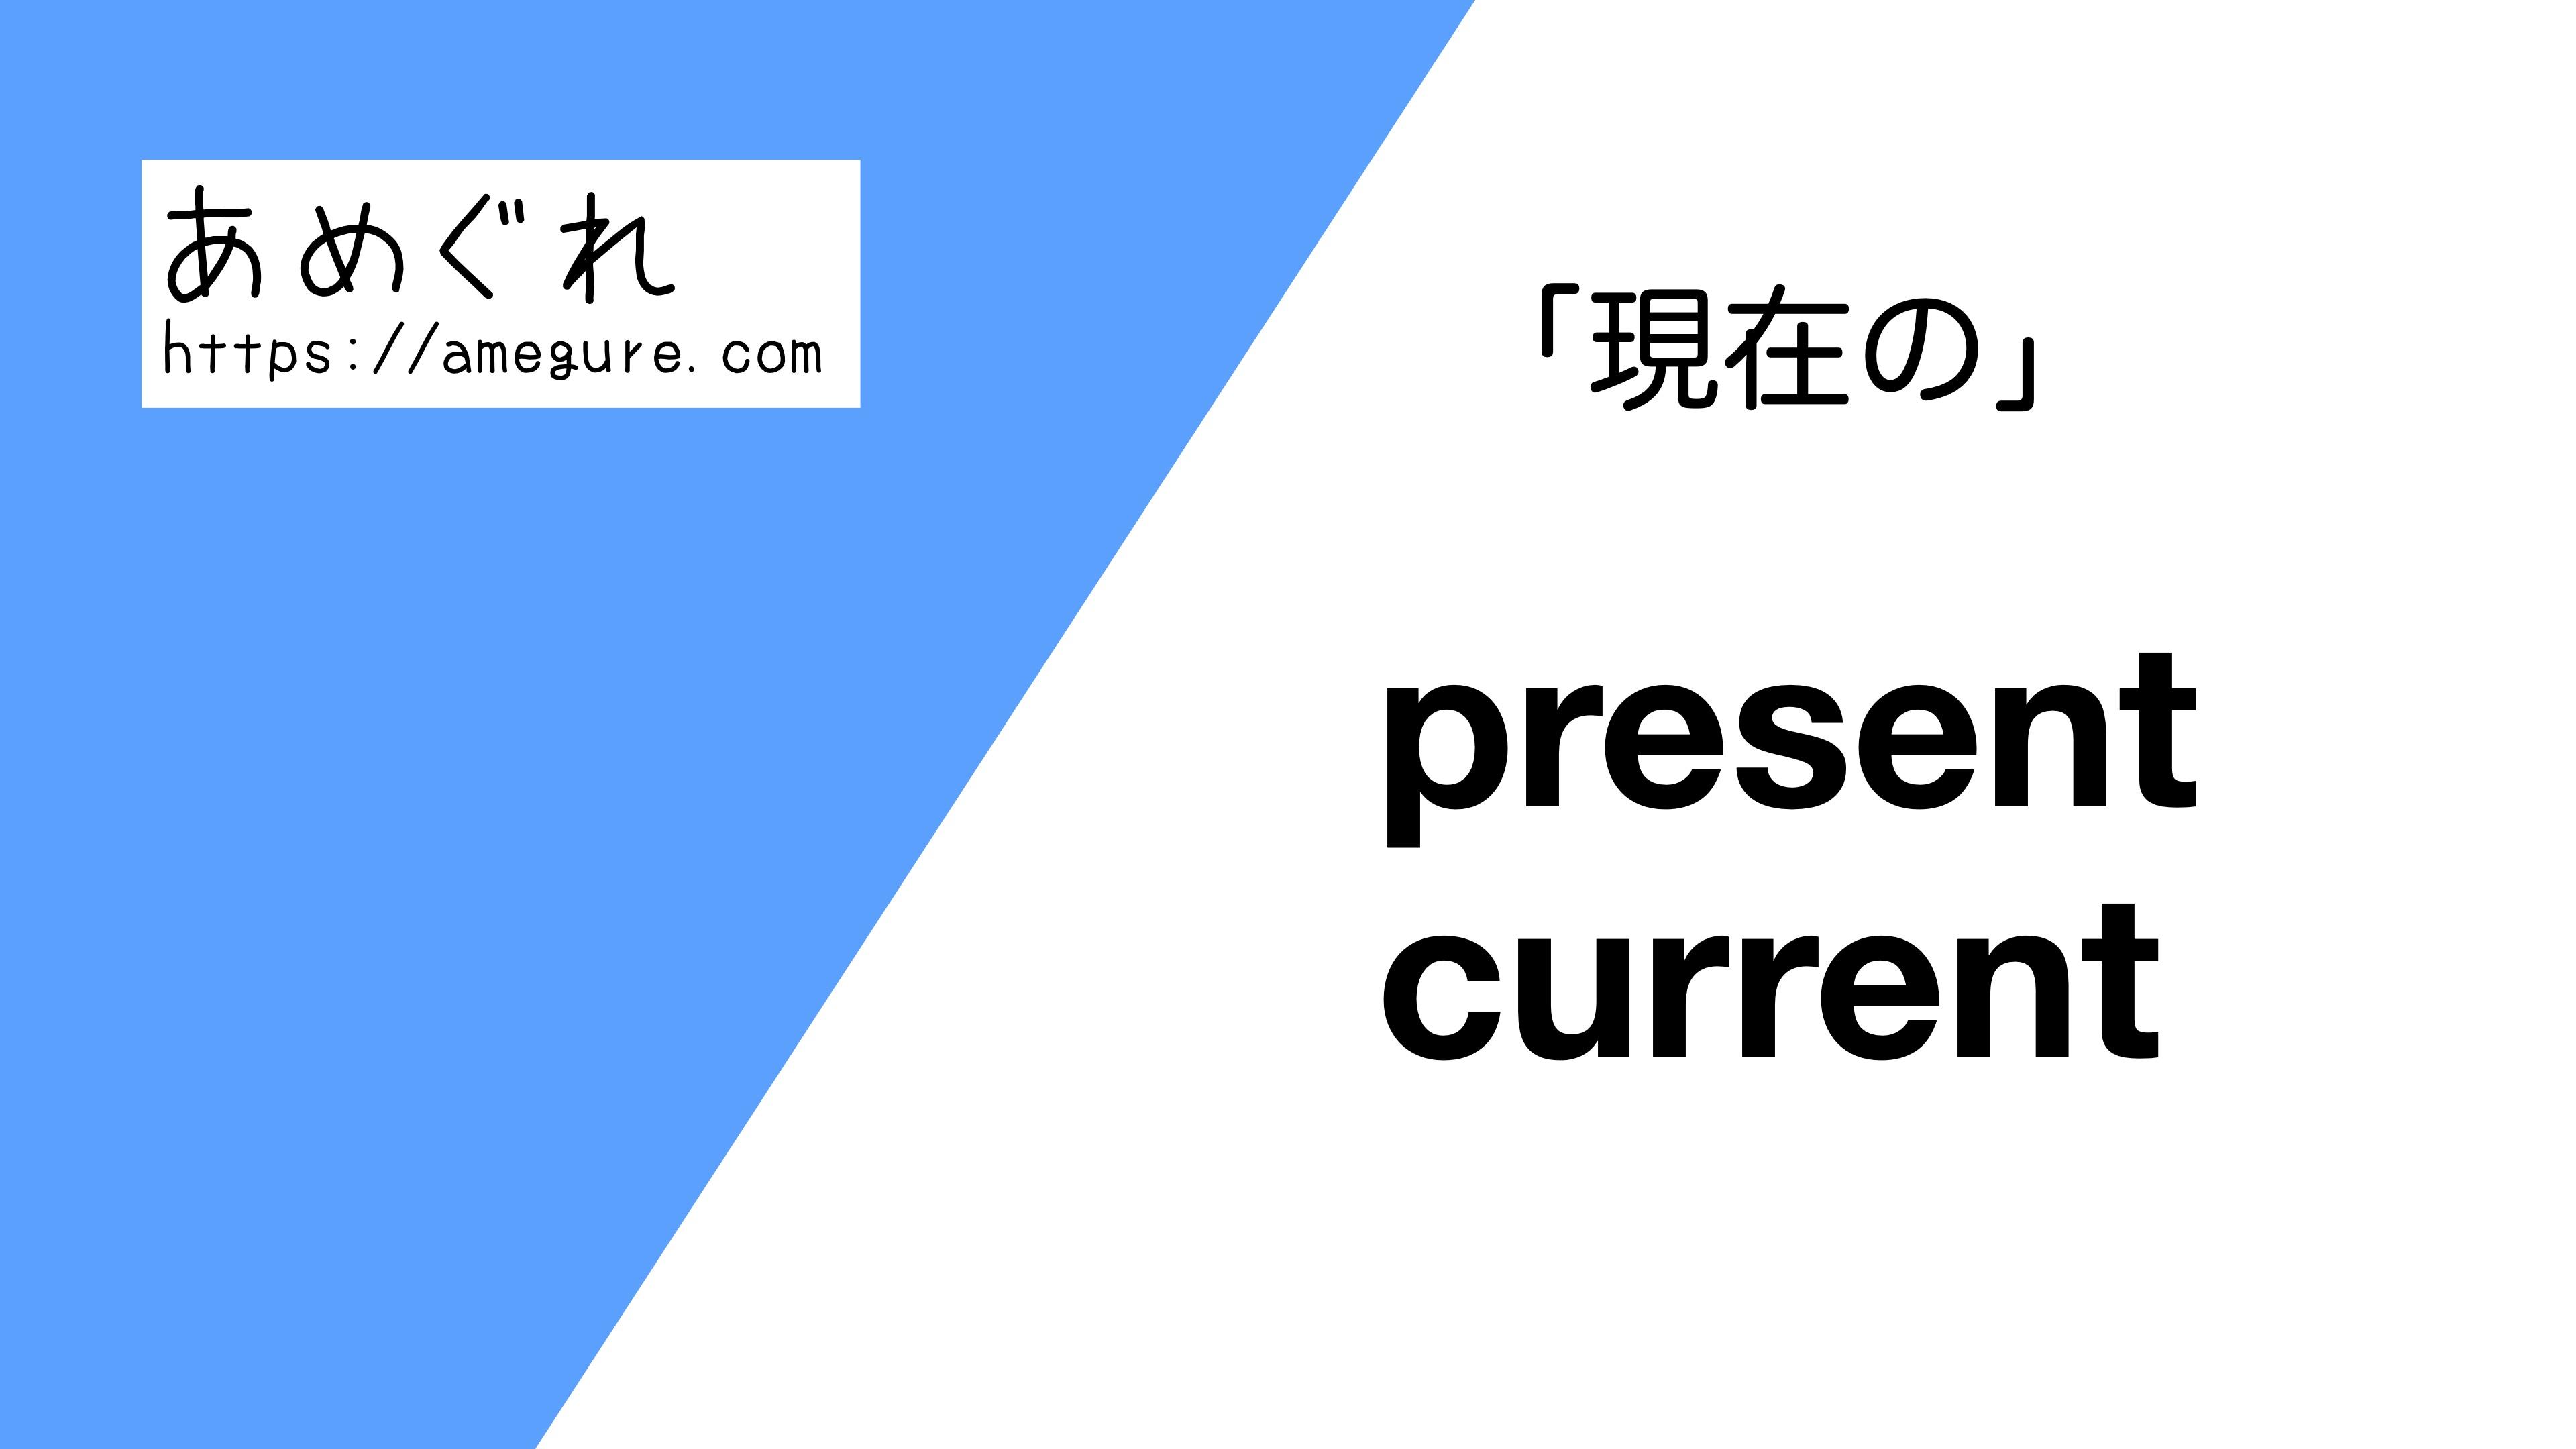 present-current違い